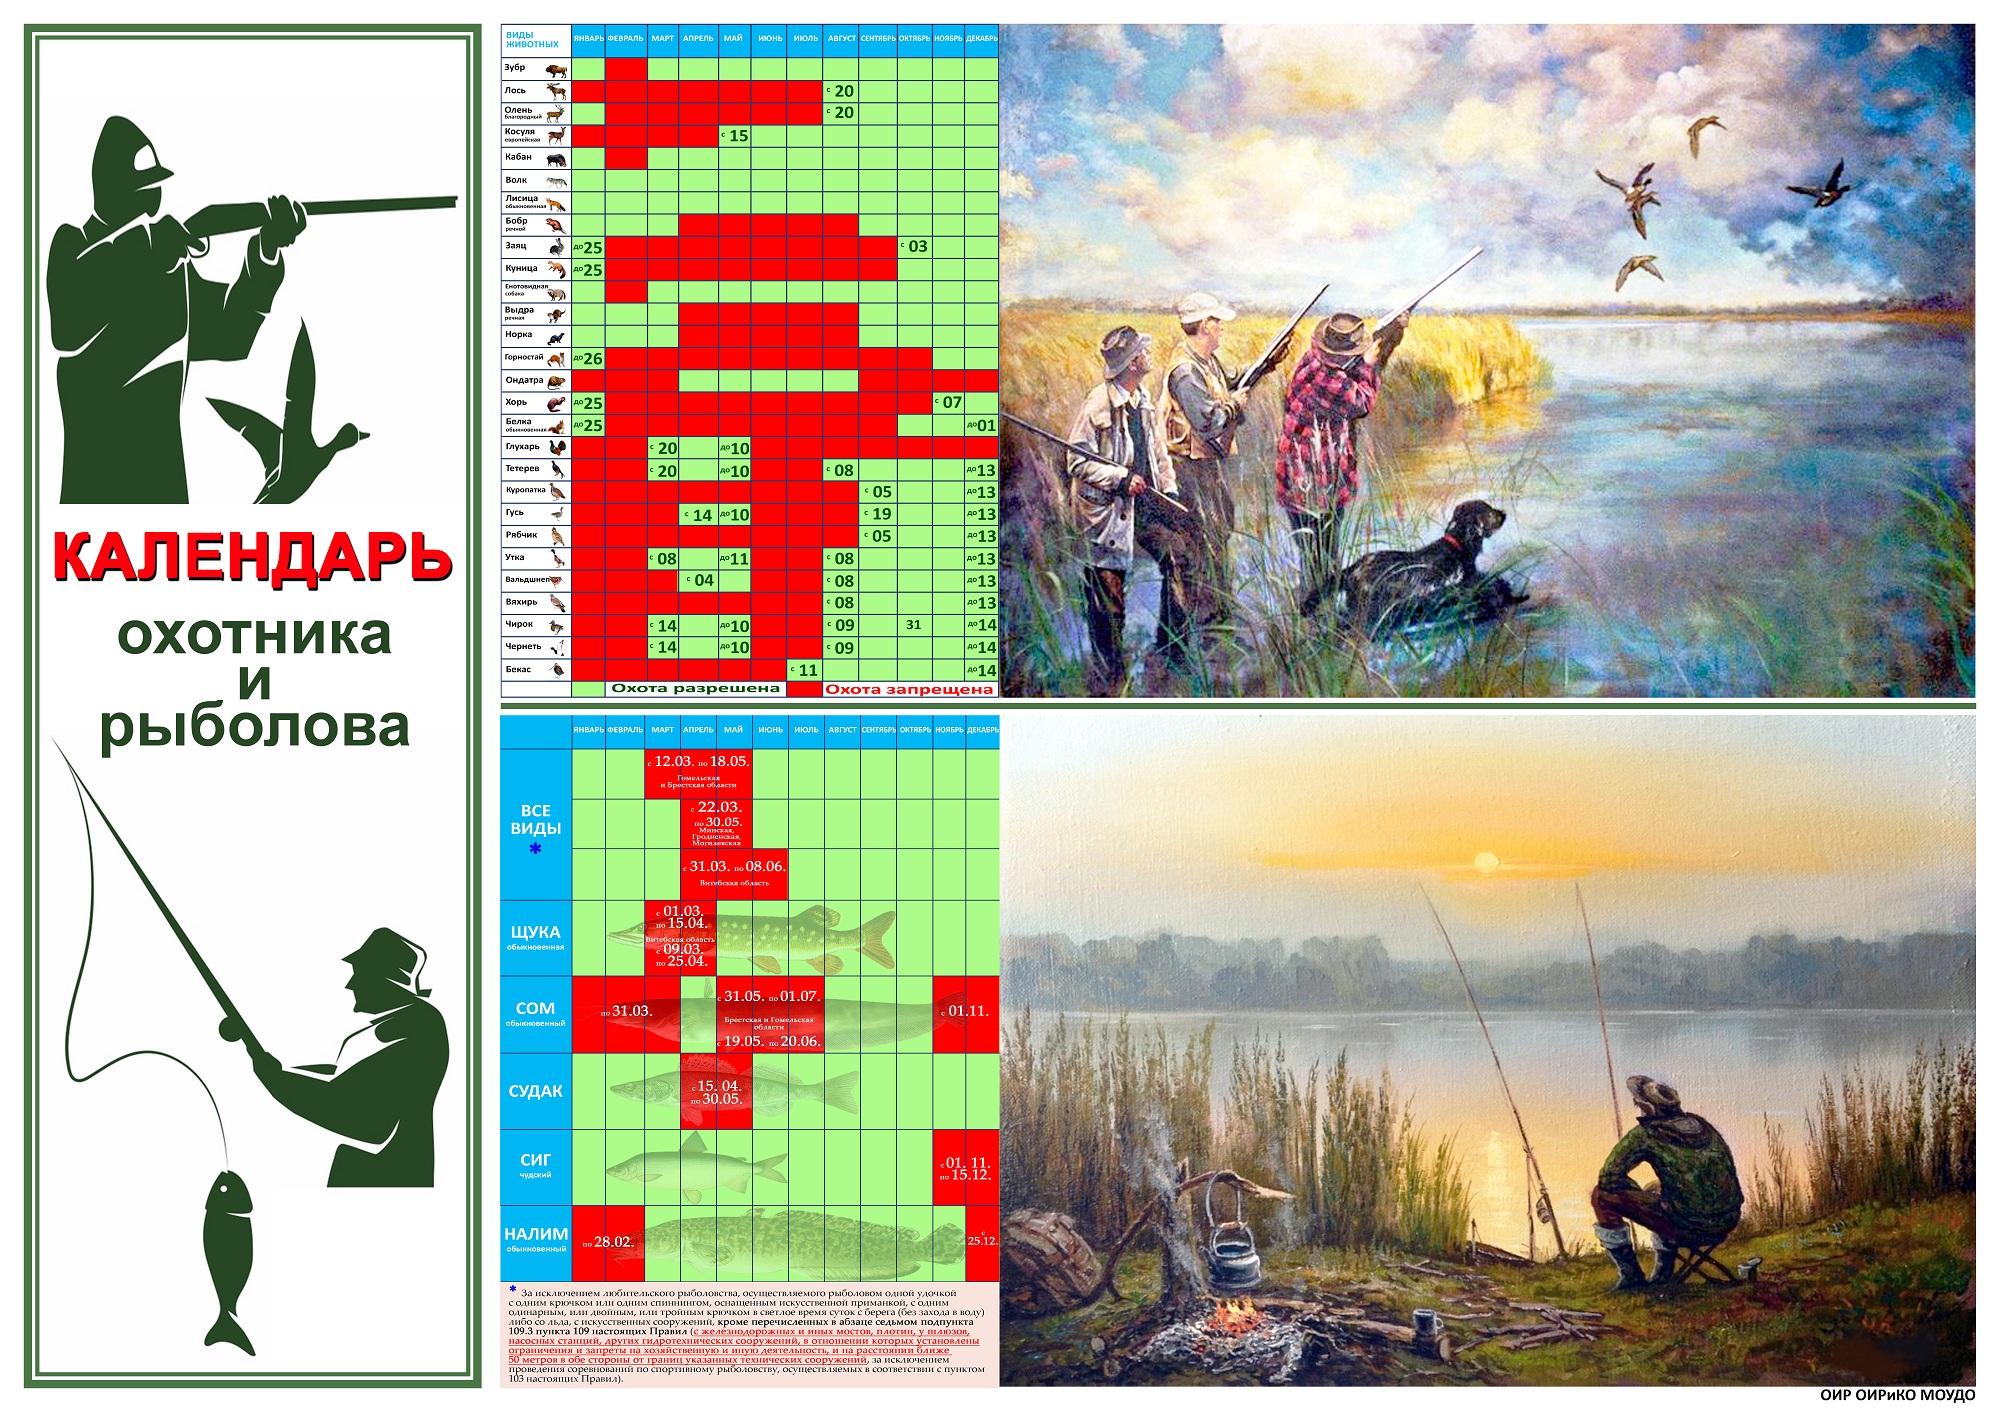 Стенгазета формата А1 - Календарь охотника и рыболова